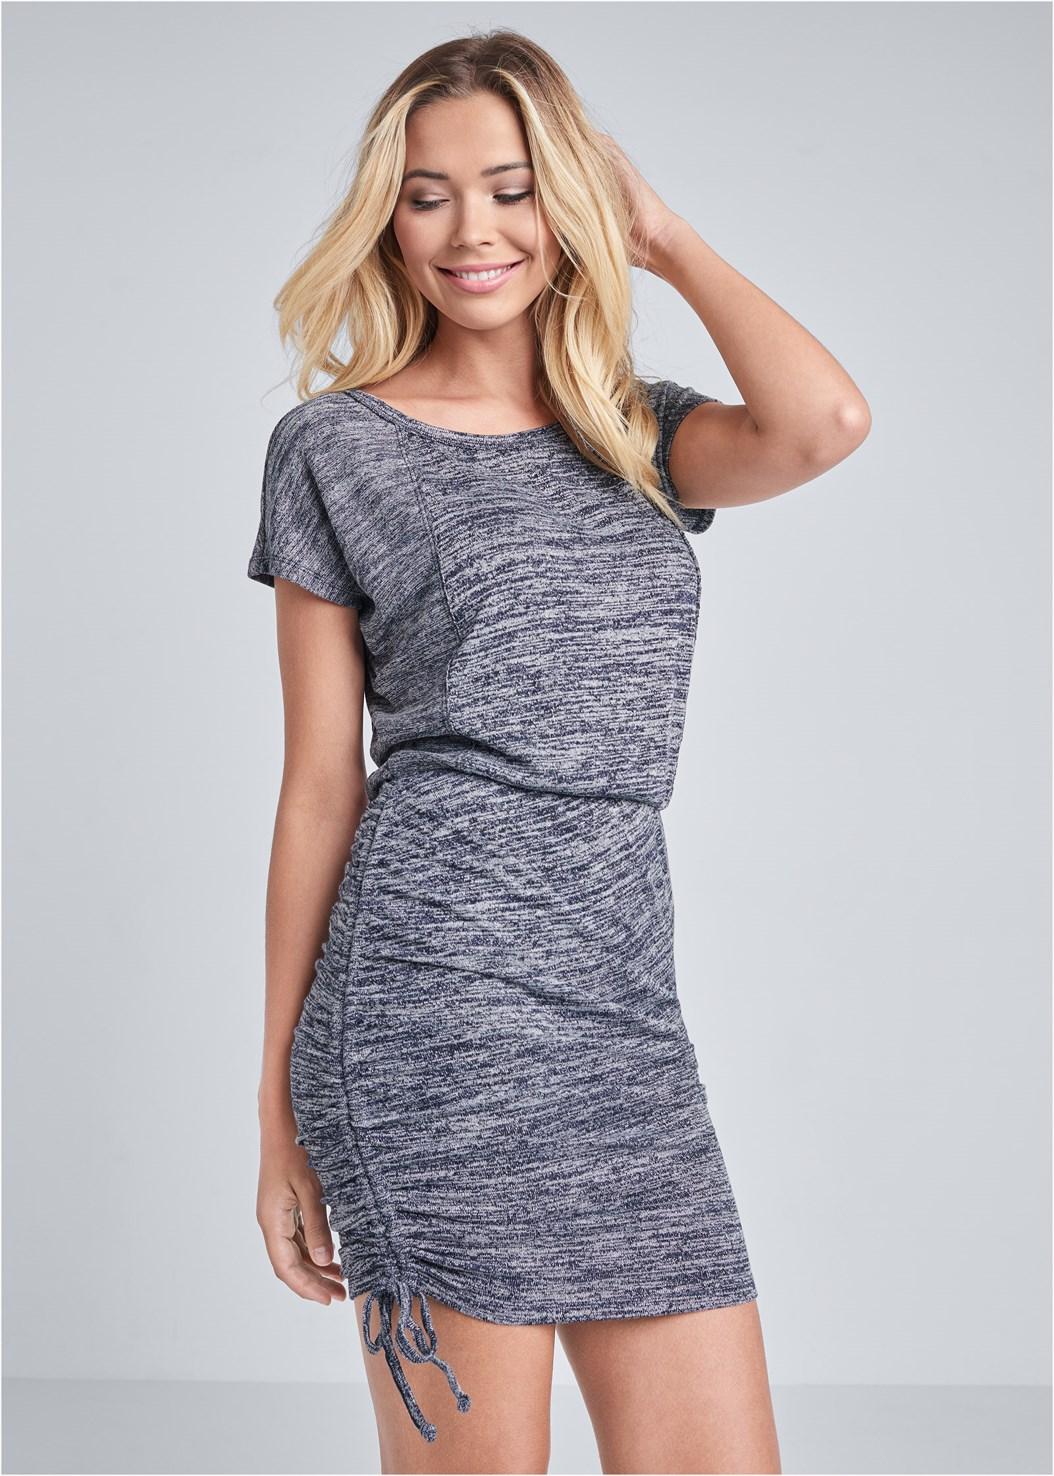 Cozy Drawstring Tie Lounge Dress,Seamless Lace Comfort Bra,Lace Up Gladiator Sandals,Straw Belt Bag